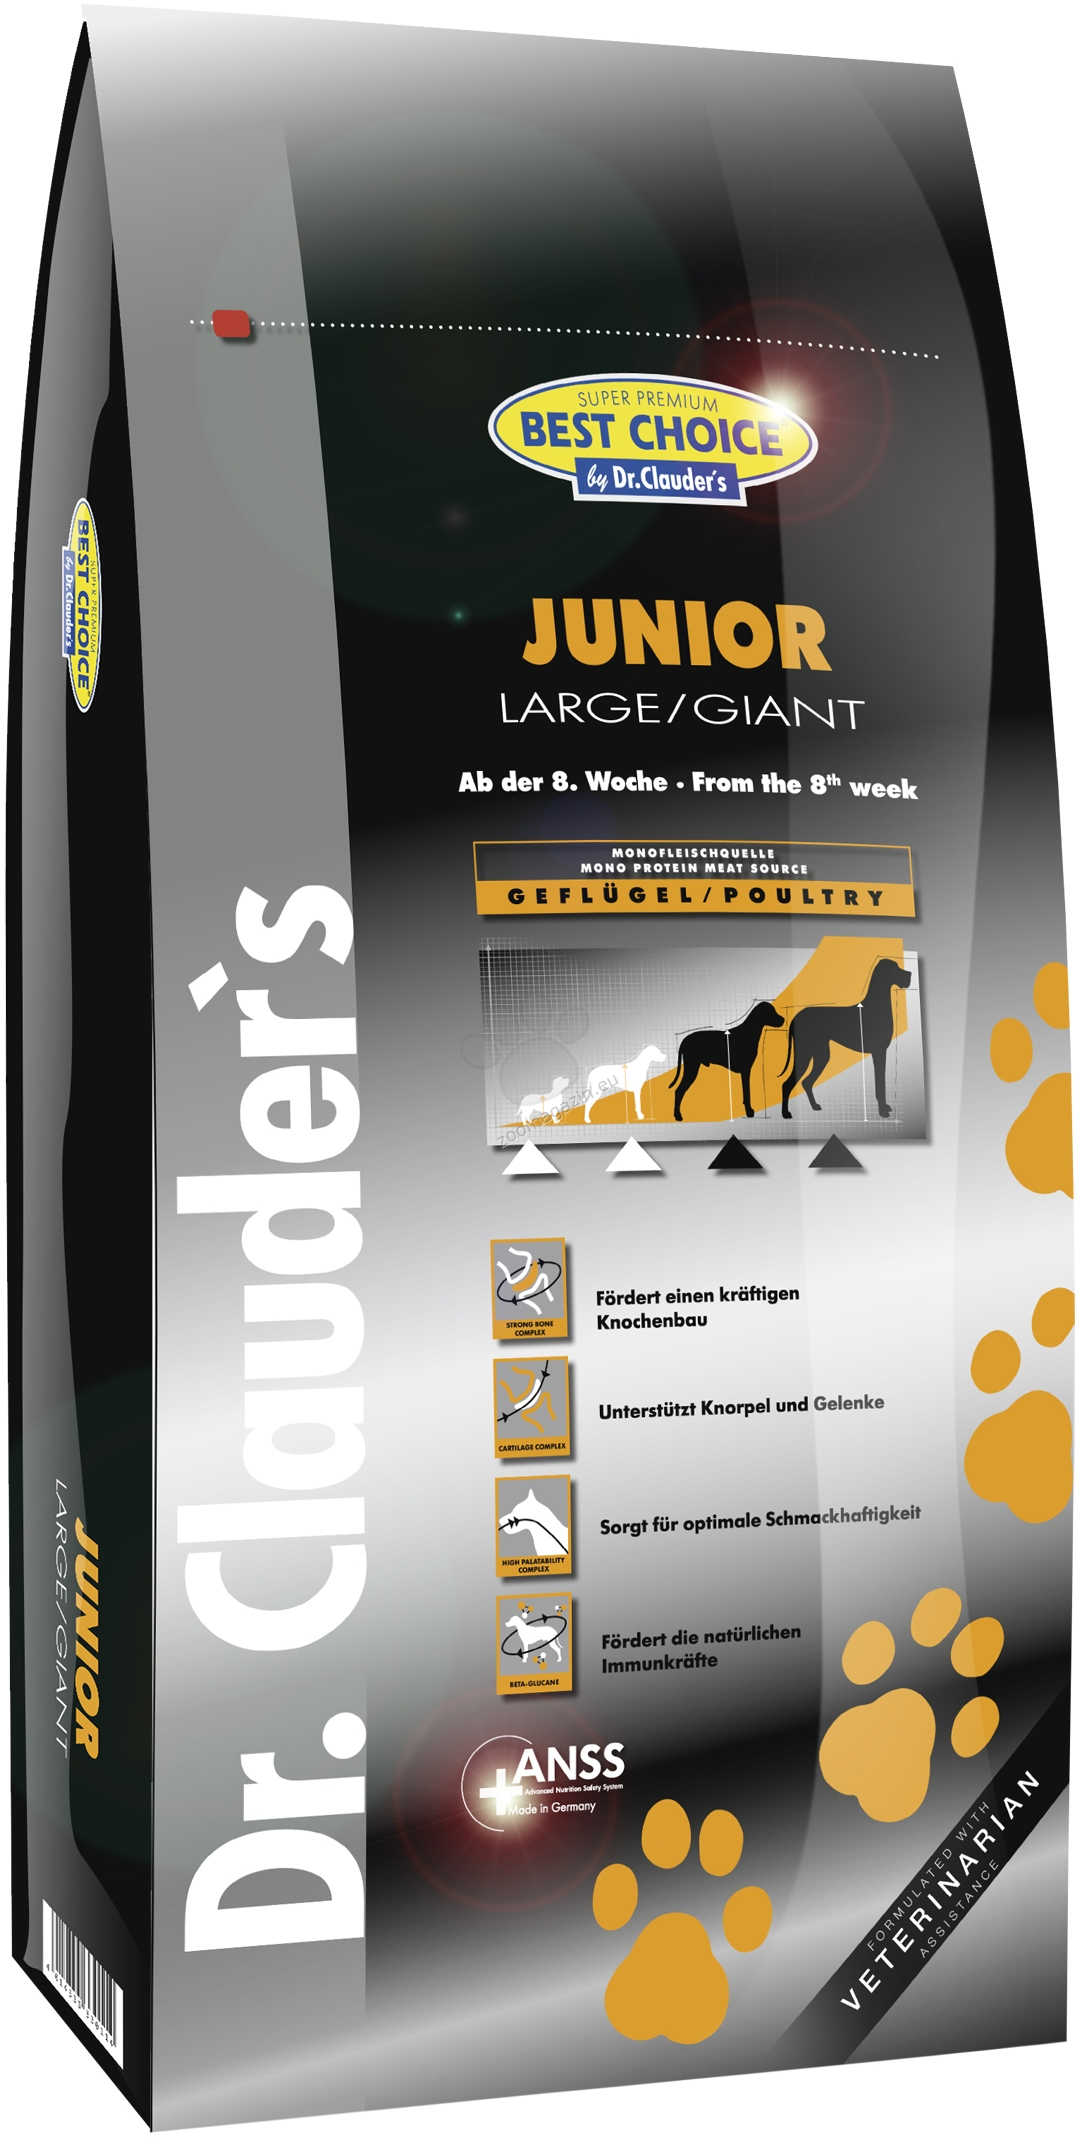 Dr. Clauder Super Premium Large Breed Junior - с прясно пилешко месо, за кучета големи и гигантски породи над 25 кг. от 2 до 18 месеца 350 гр.